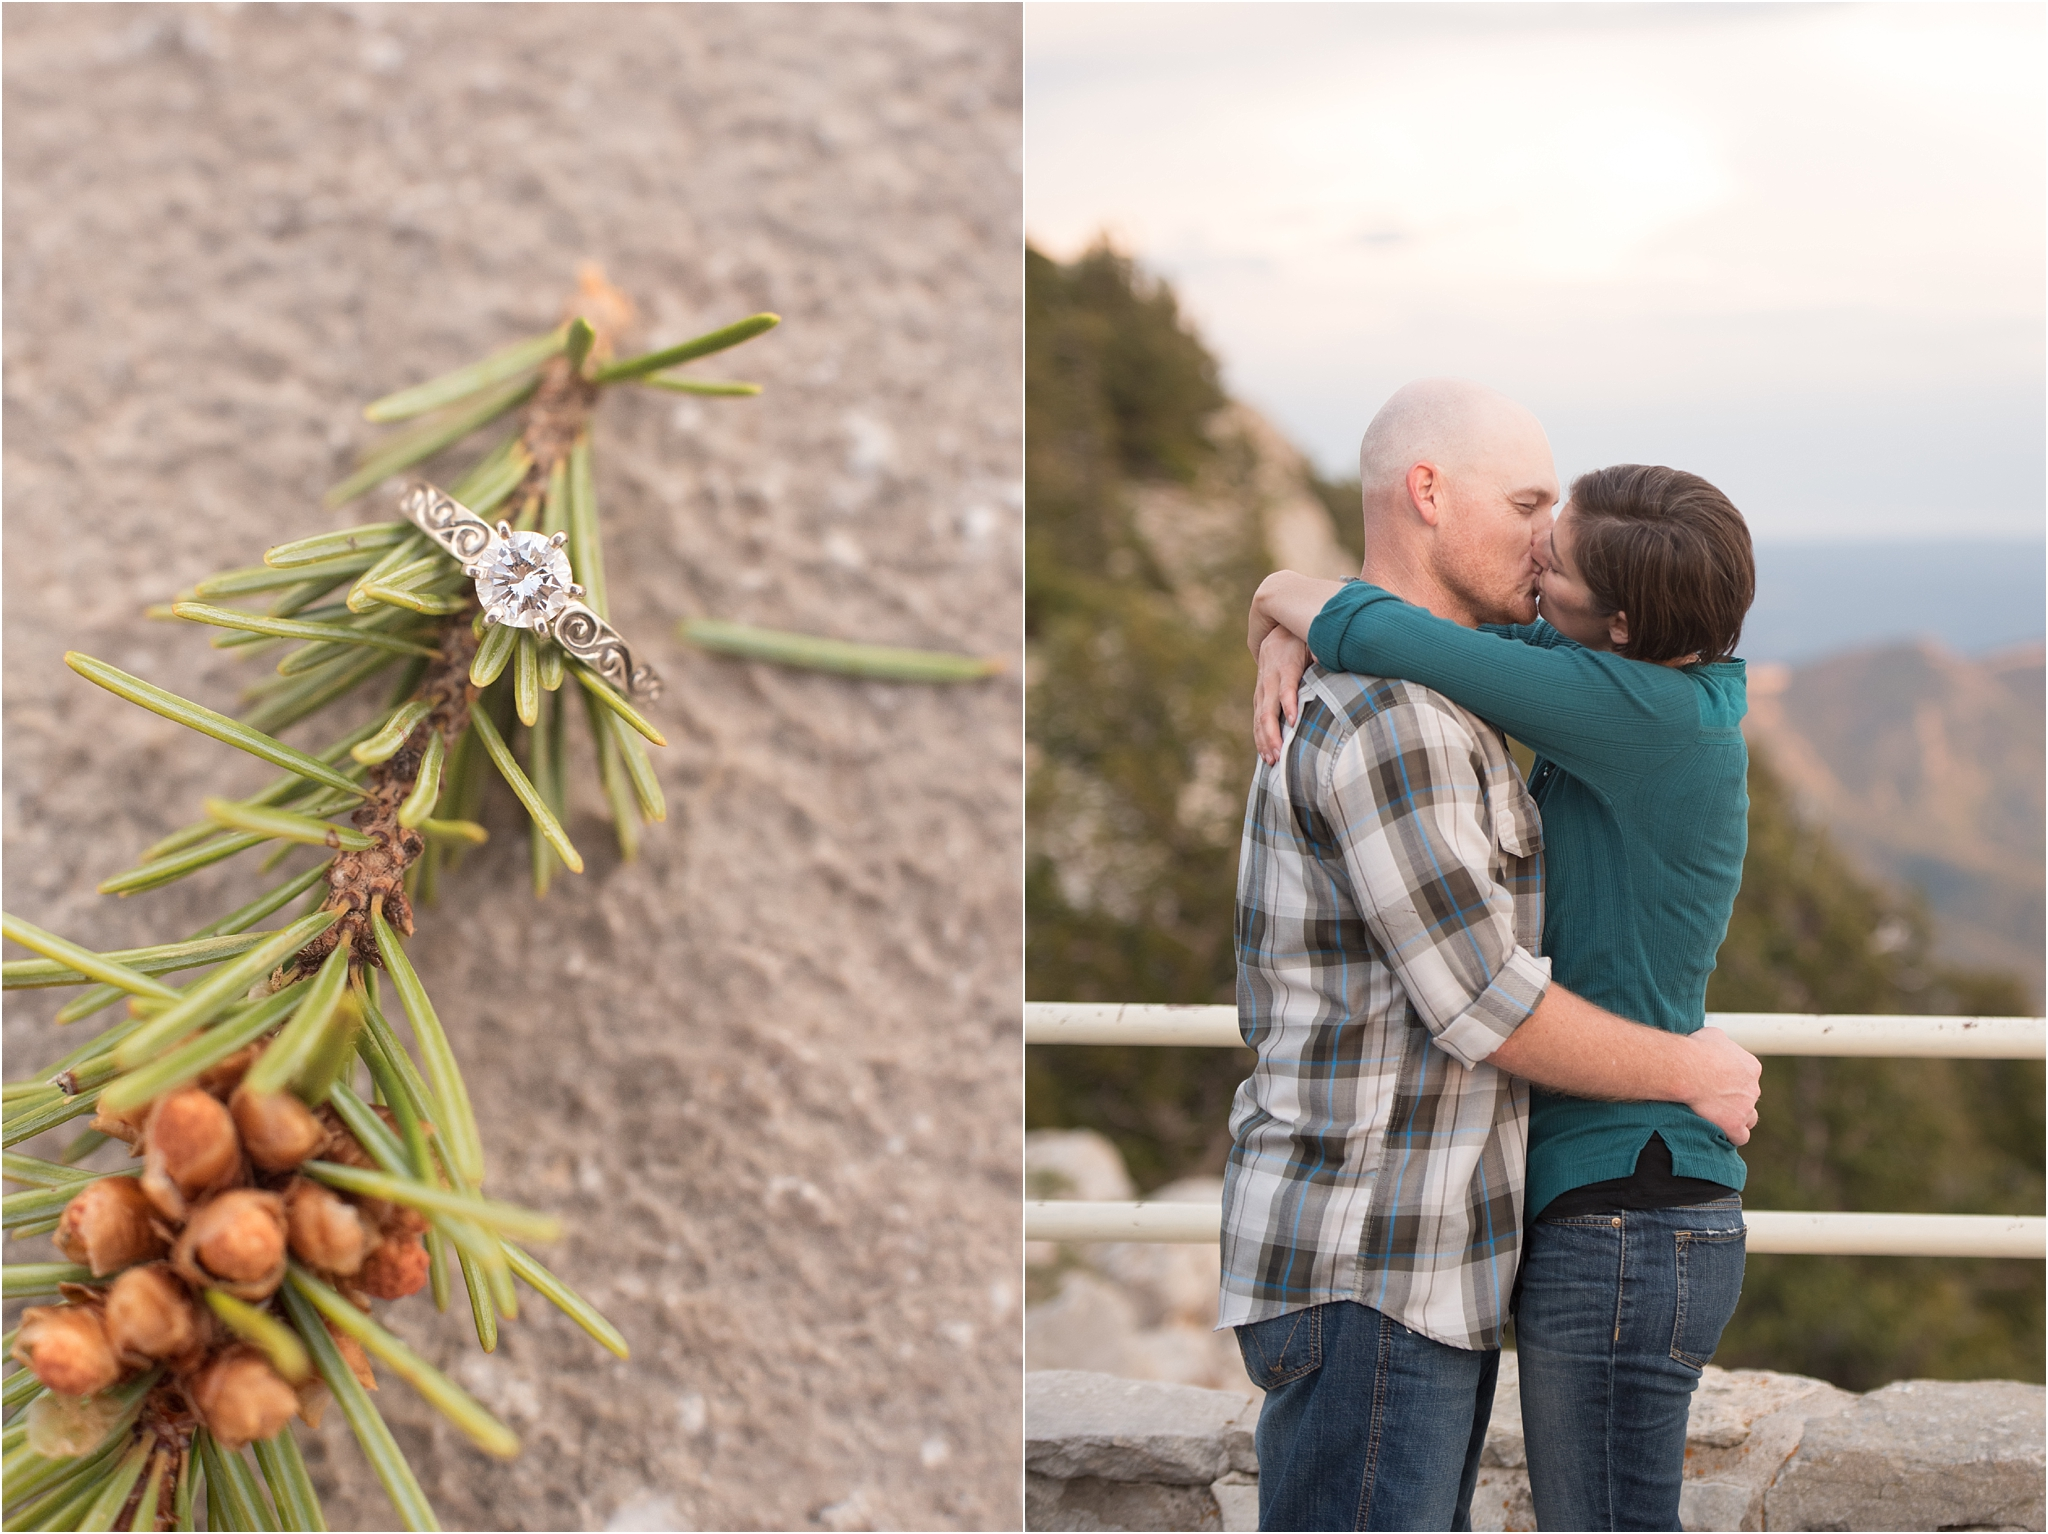 sandia crest engagement-albuquerque wedding photographer-new mexico-kayla kitts photography-sandia casino wedding